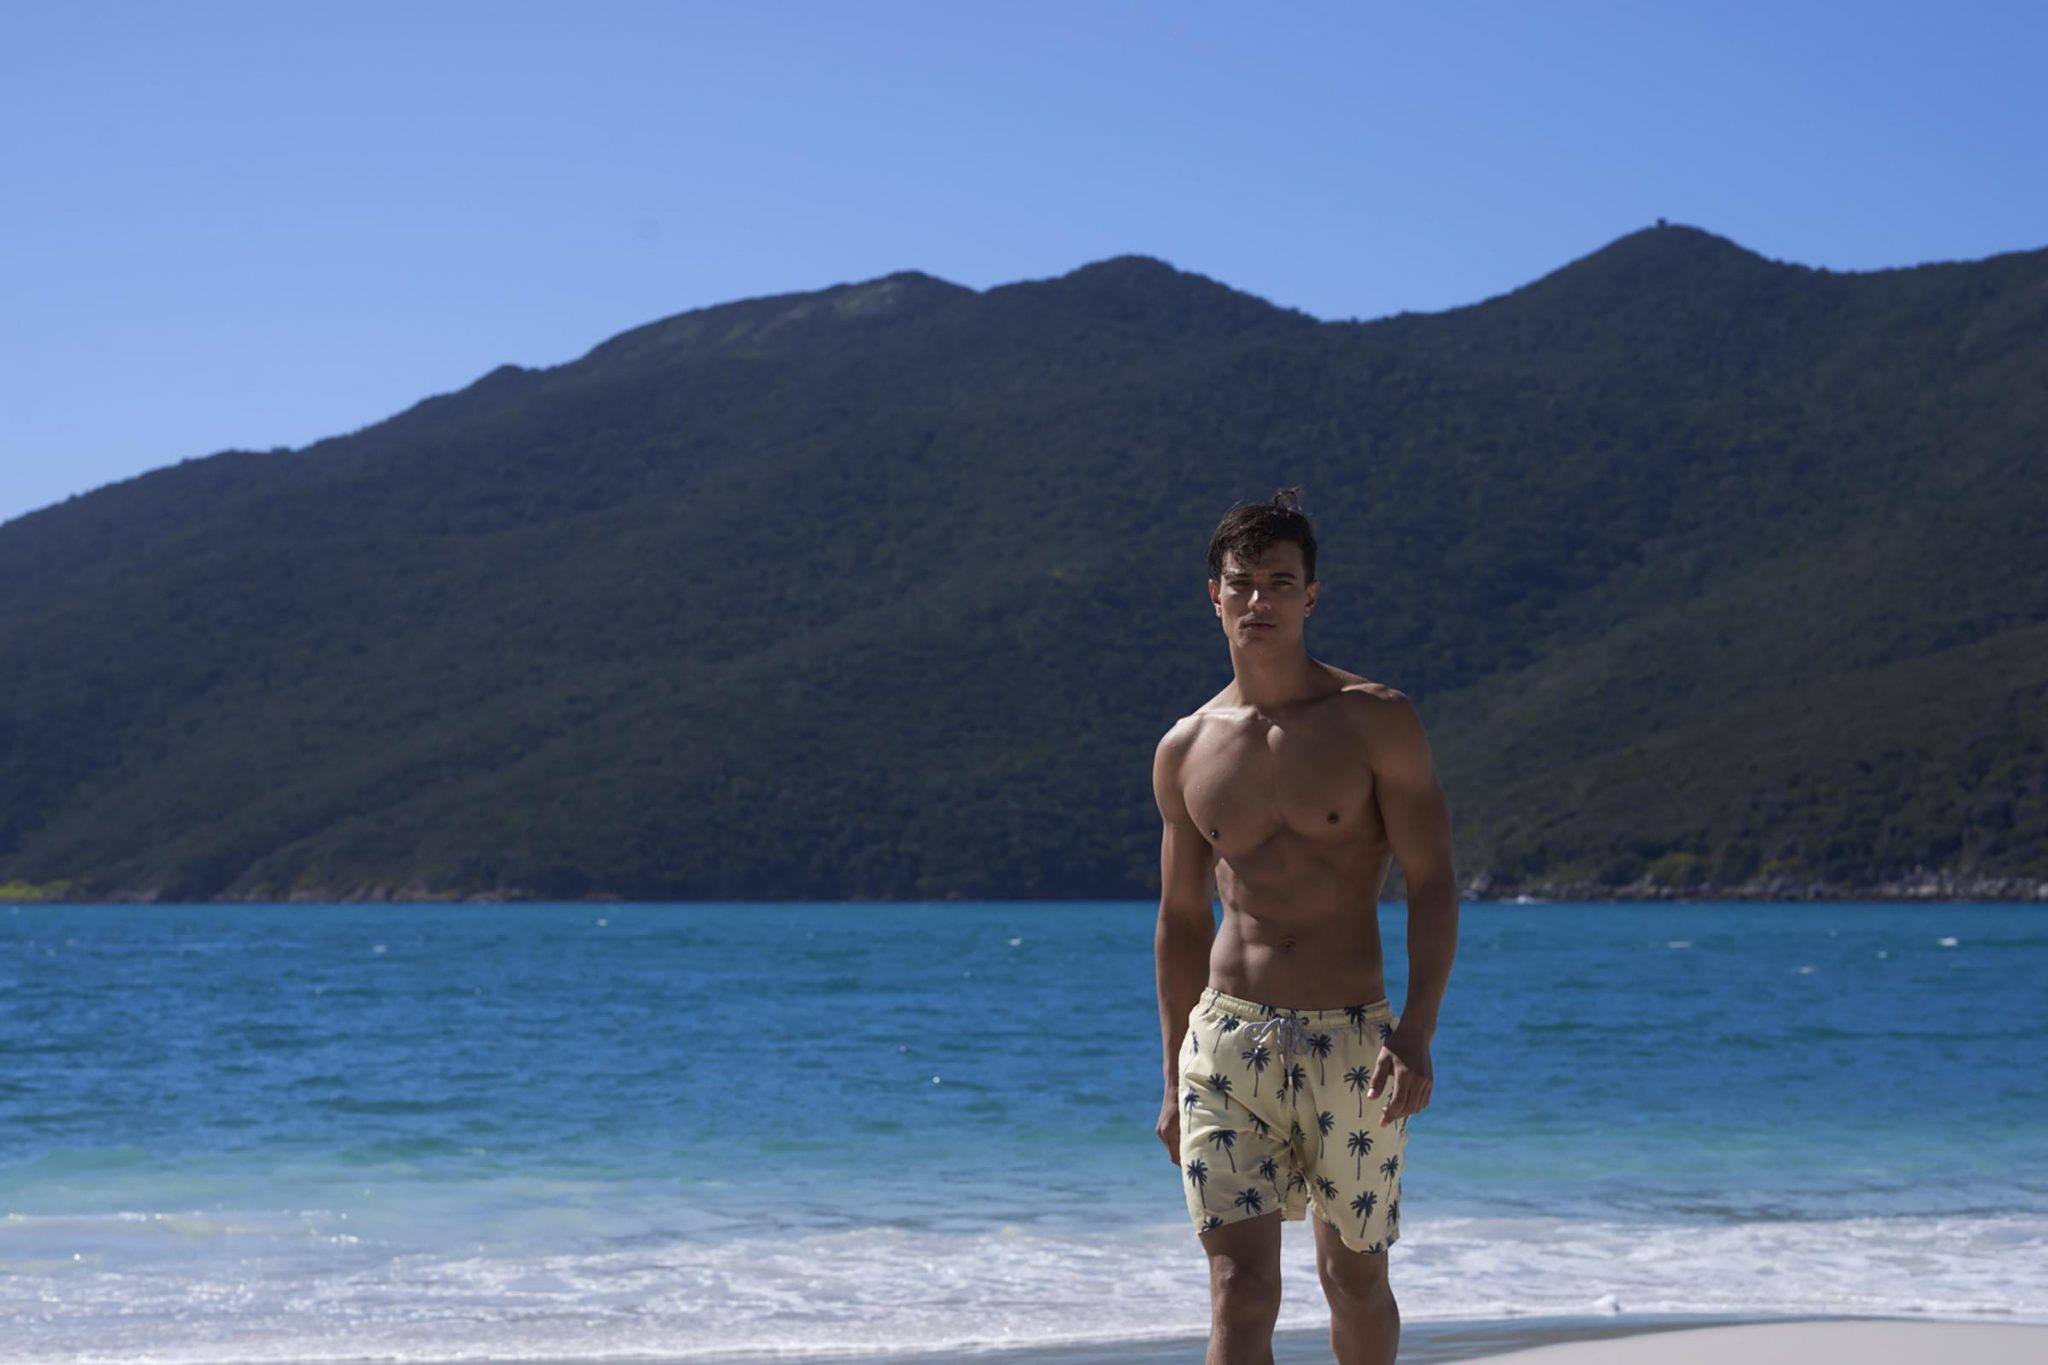 Sulevan Araujo by Chrystian Henrique for Catamaran and Brazilian Male Model